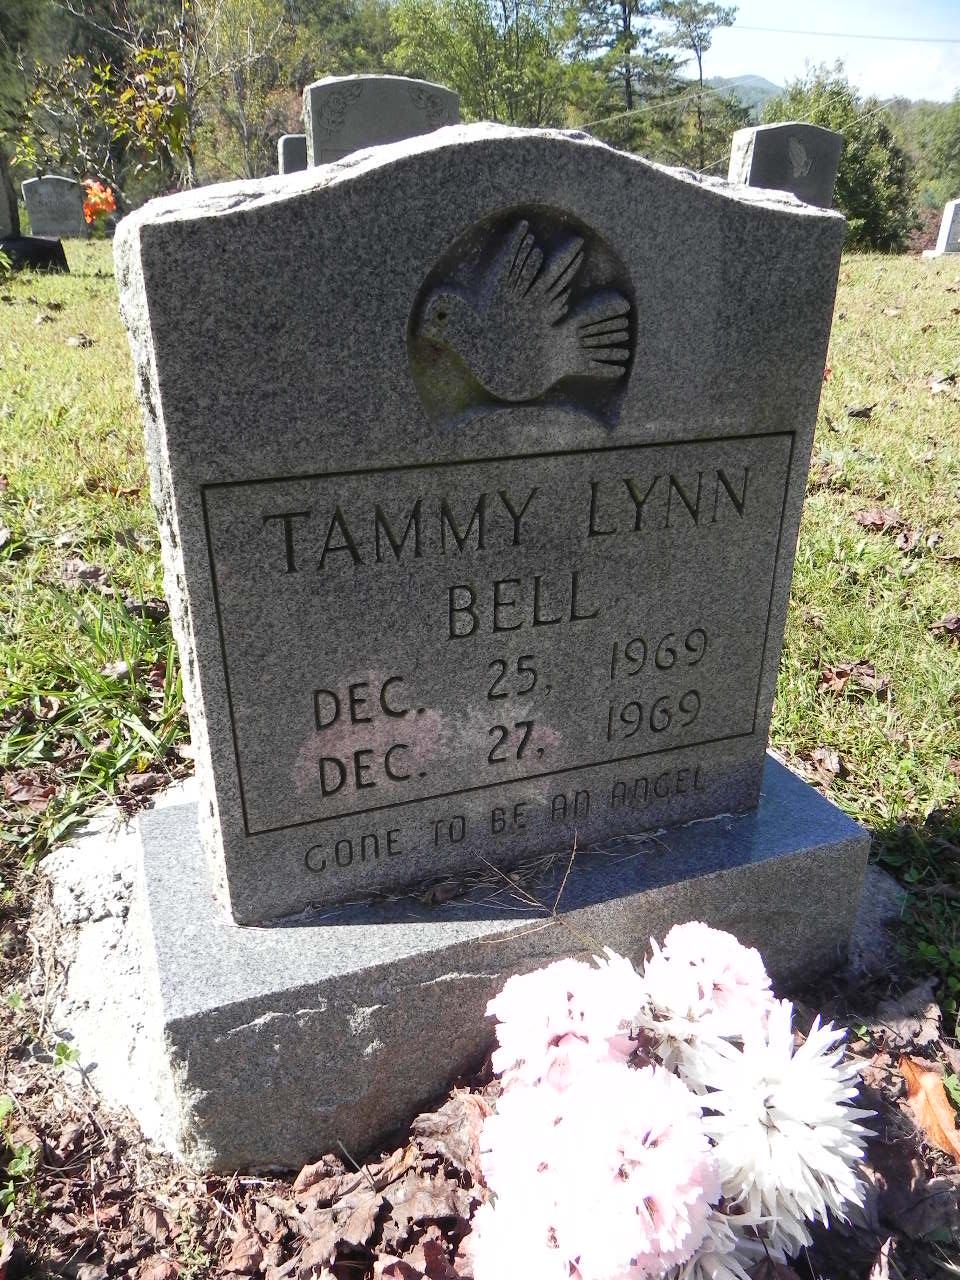 Tammy Lynn Bell